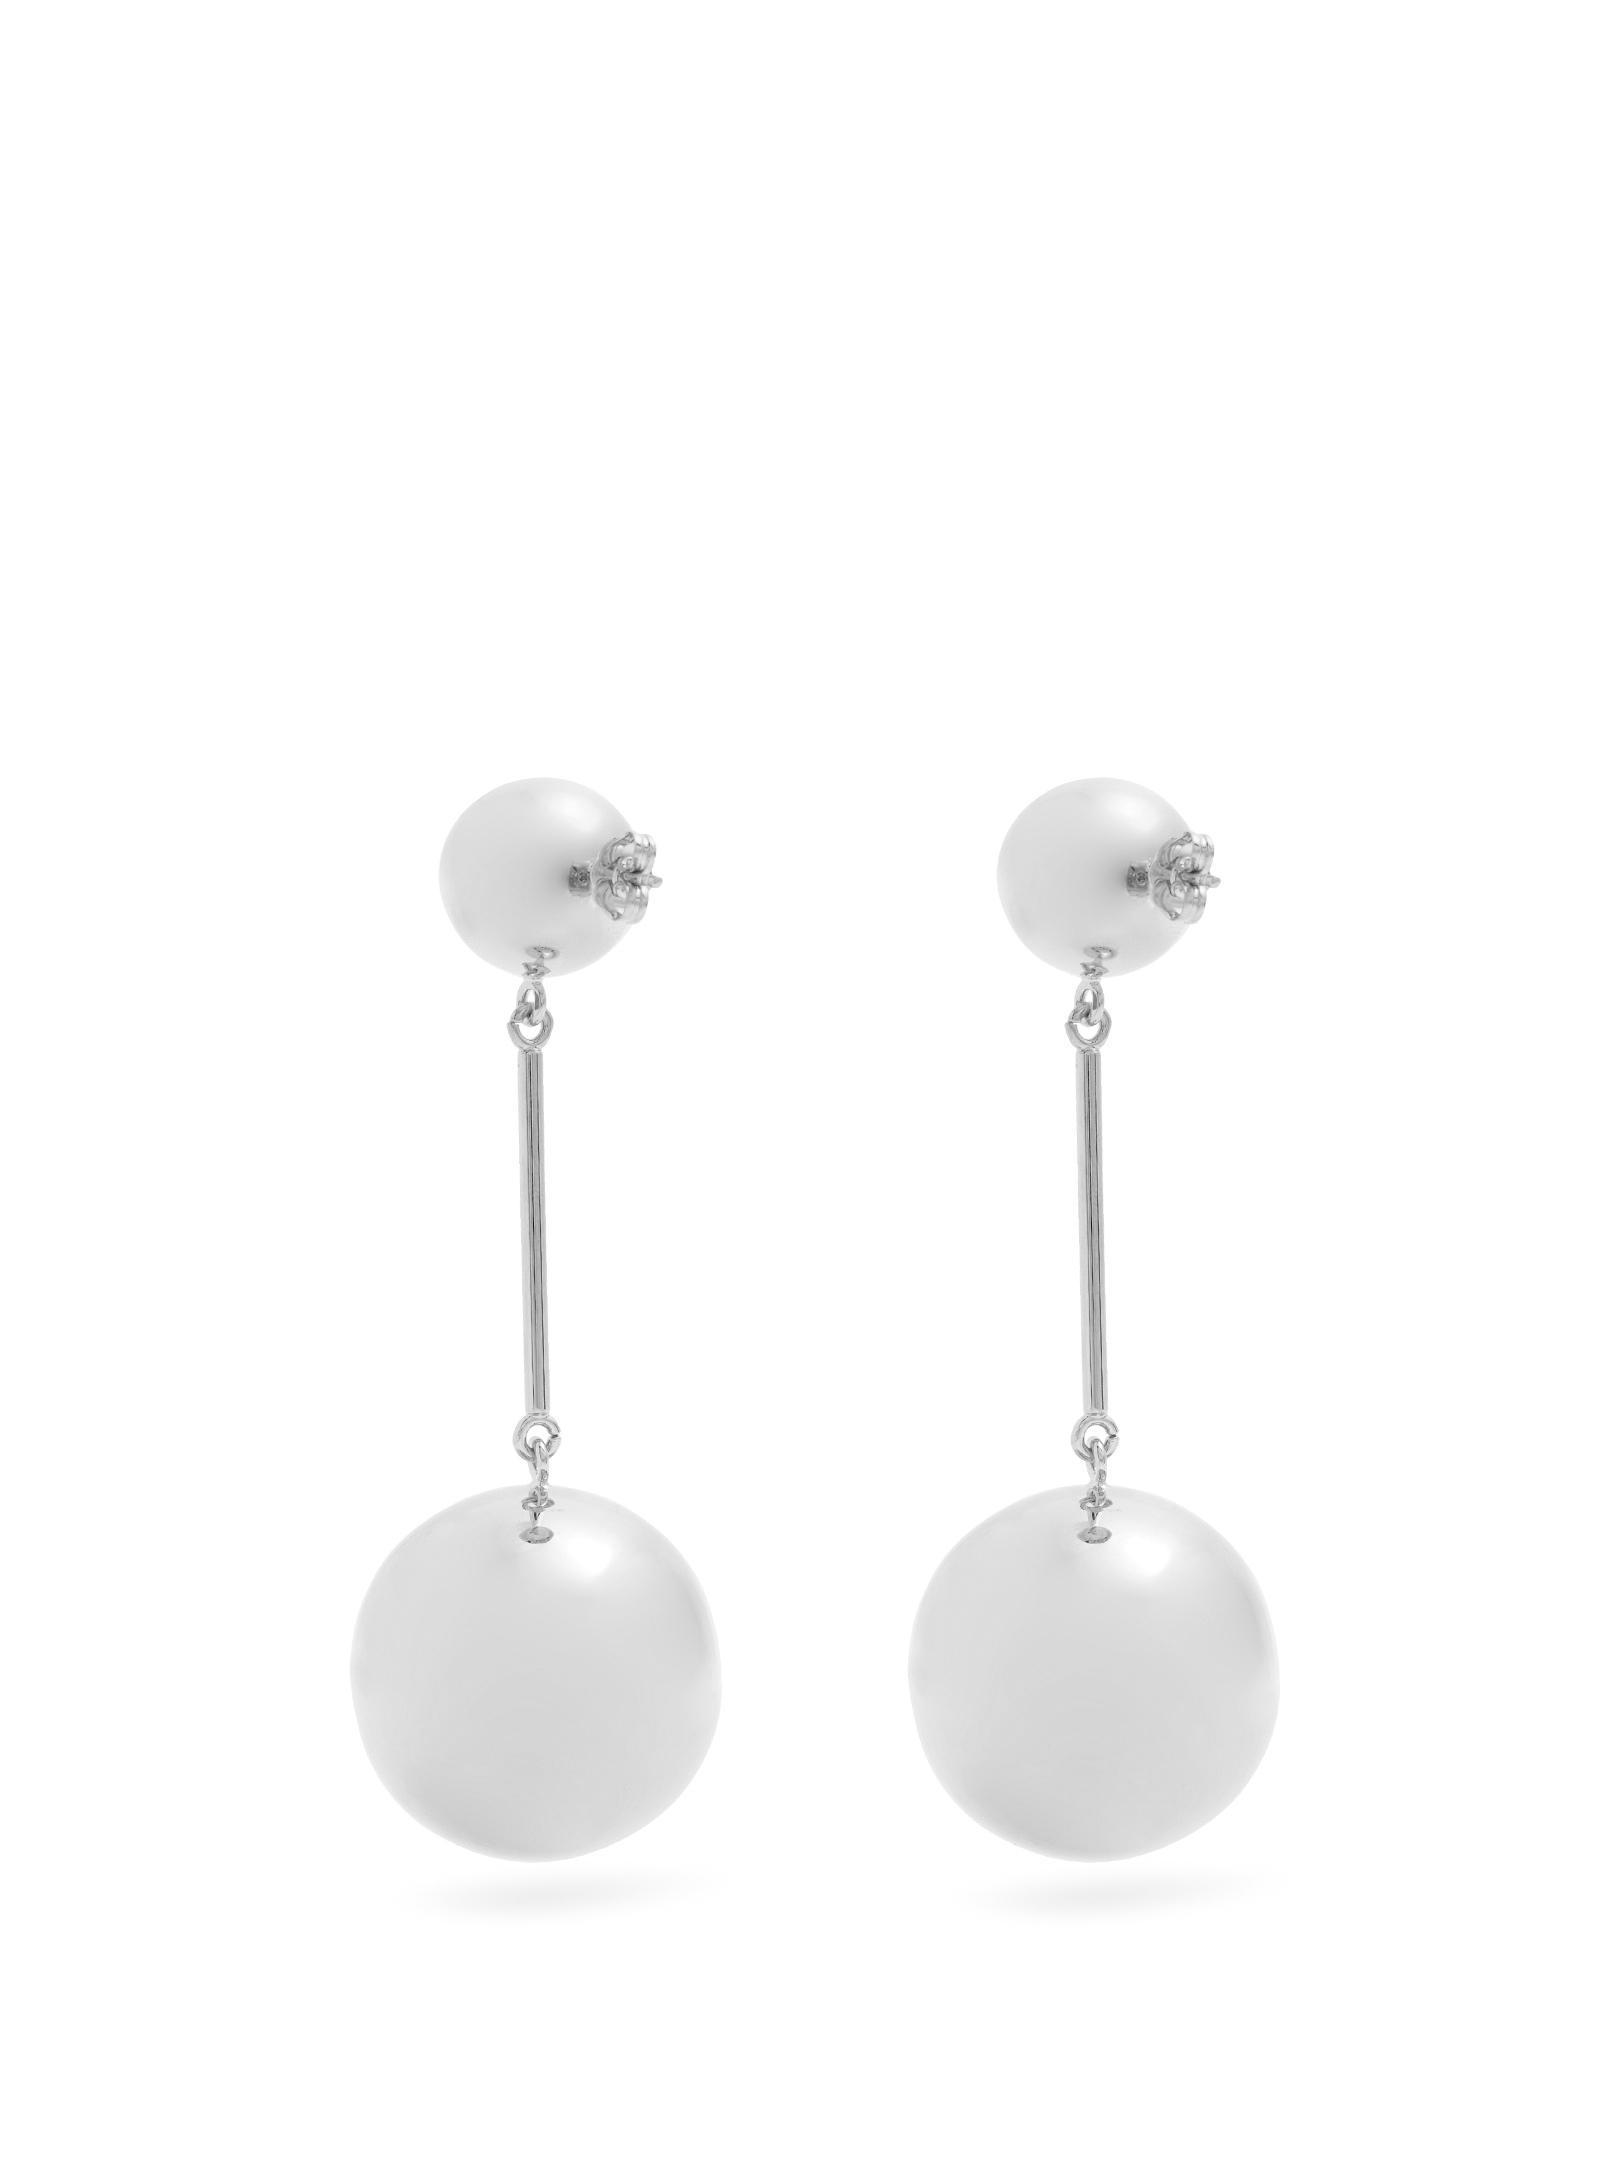 J.W.Anderson Sphere palladium-plated earrings DfX6Dh